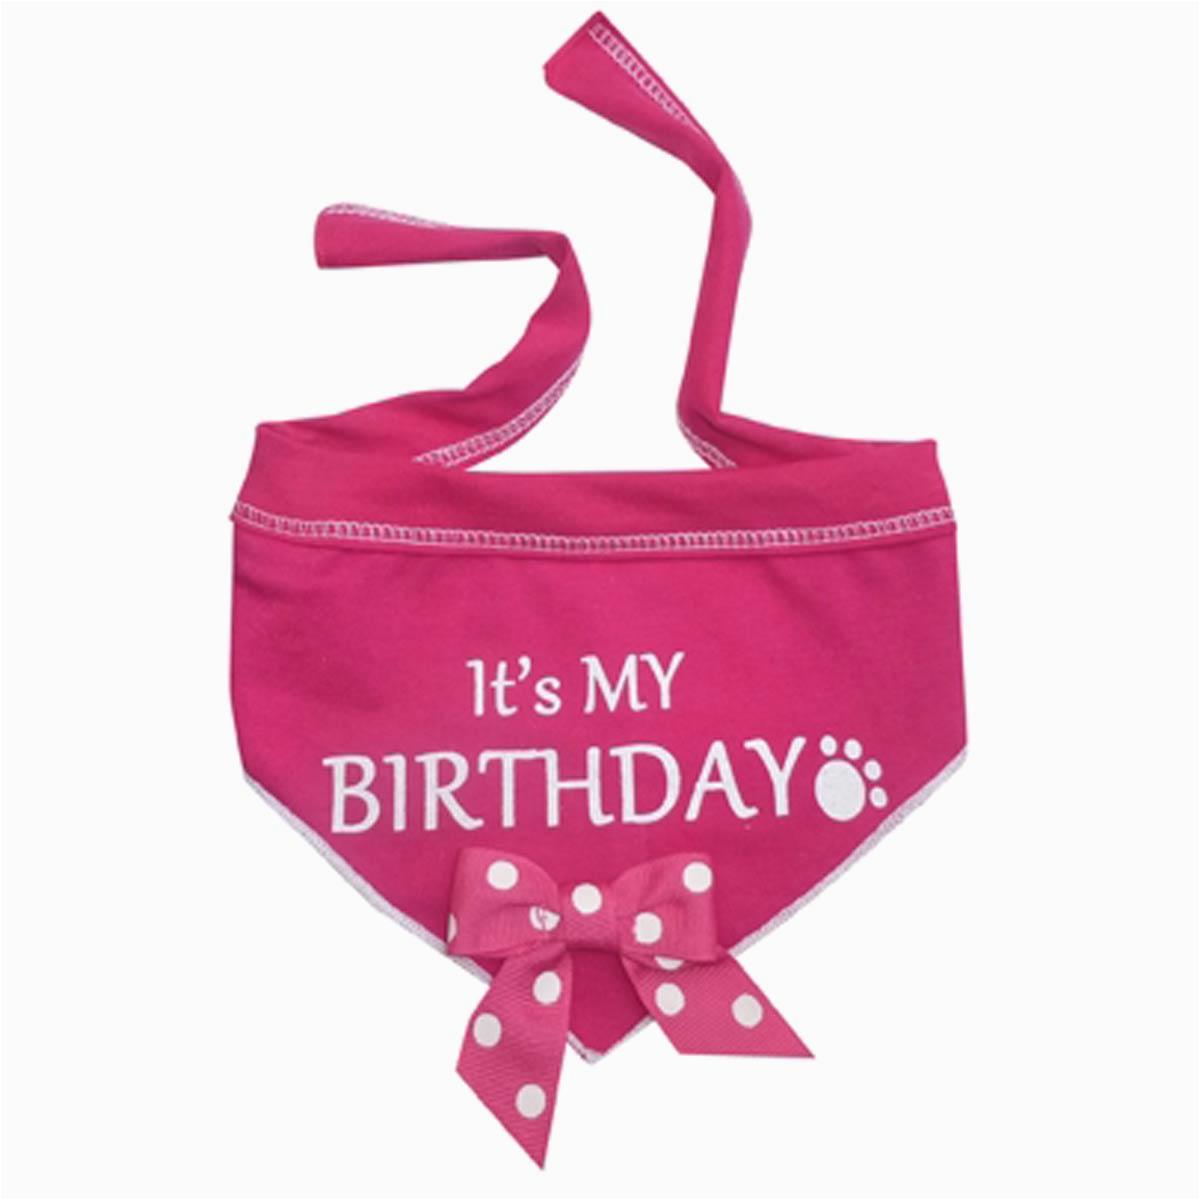 its my birthday dog bandana scarf pink